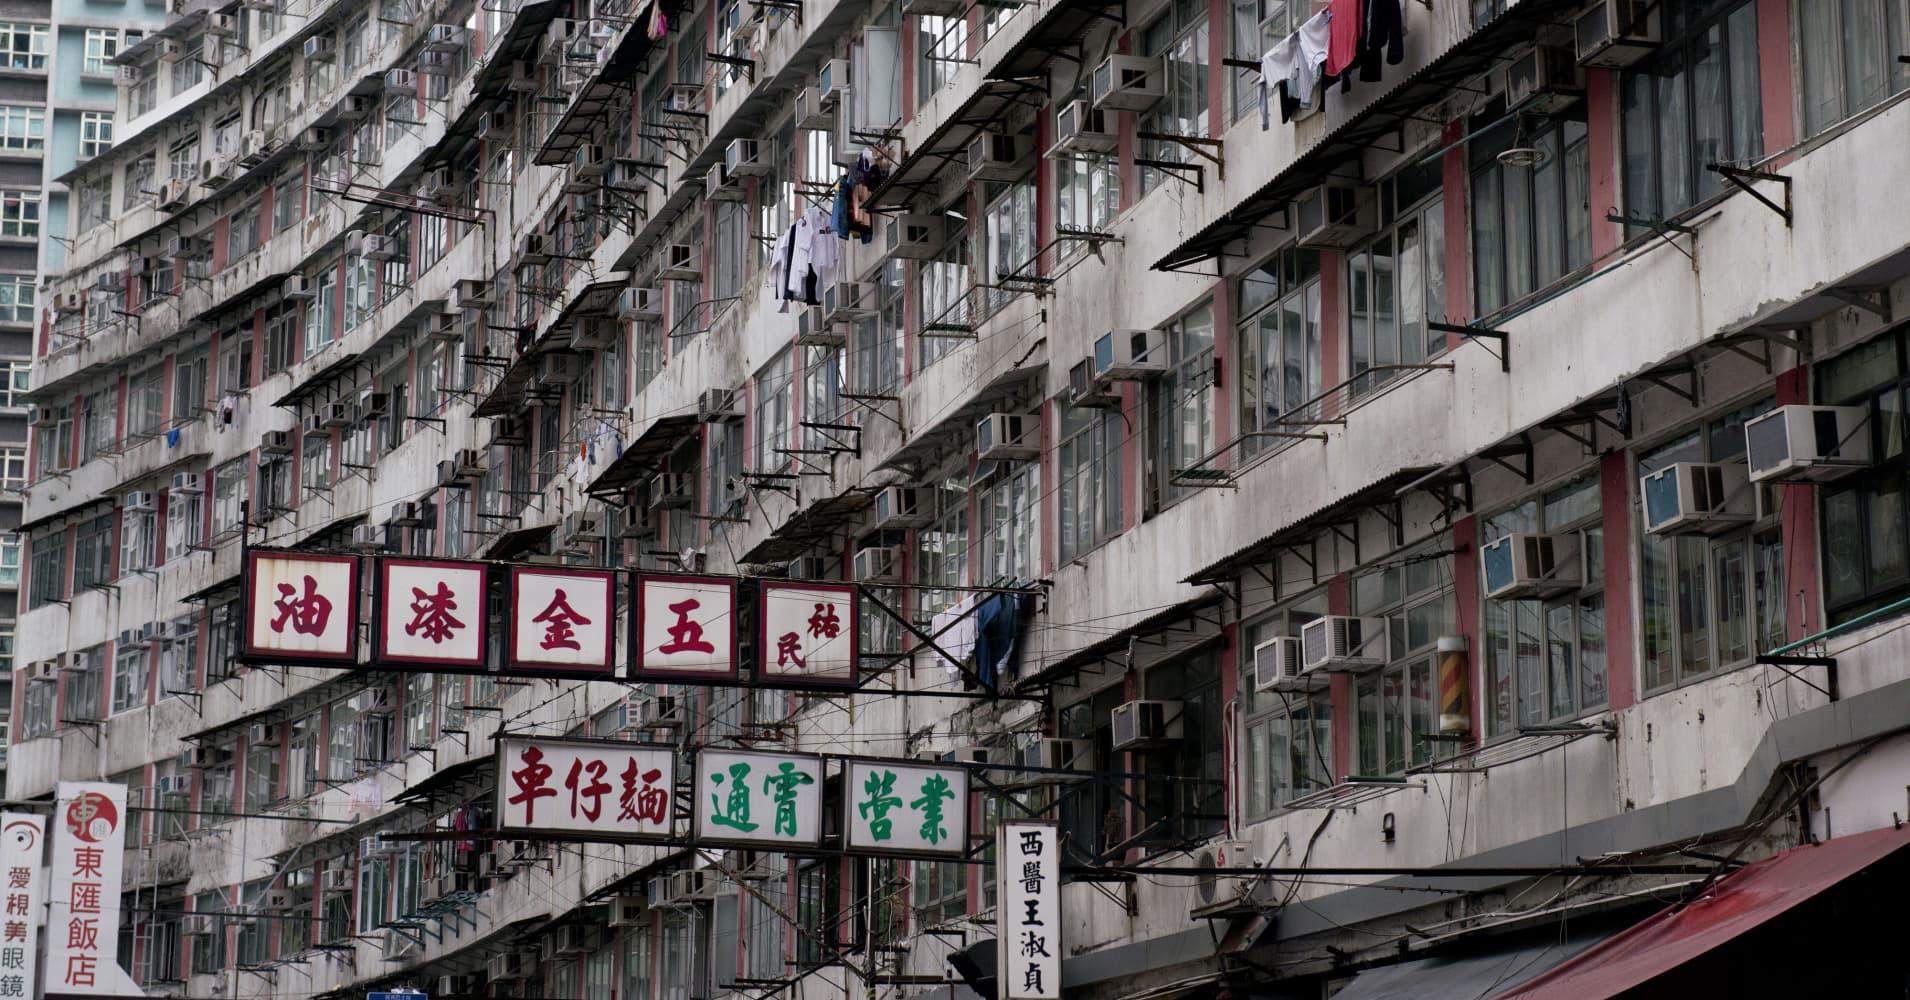 Hong Kong housing prices could fall 25 percent next year if trade war worsens